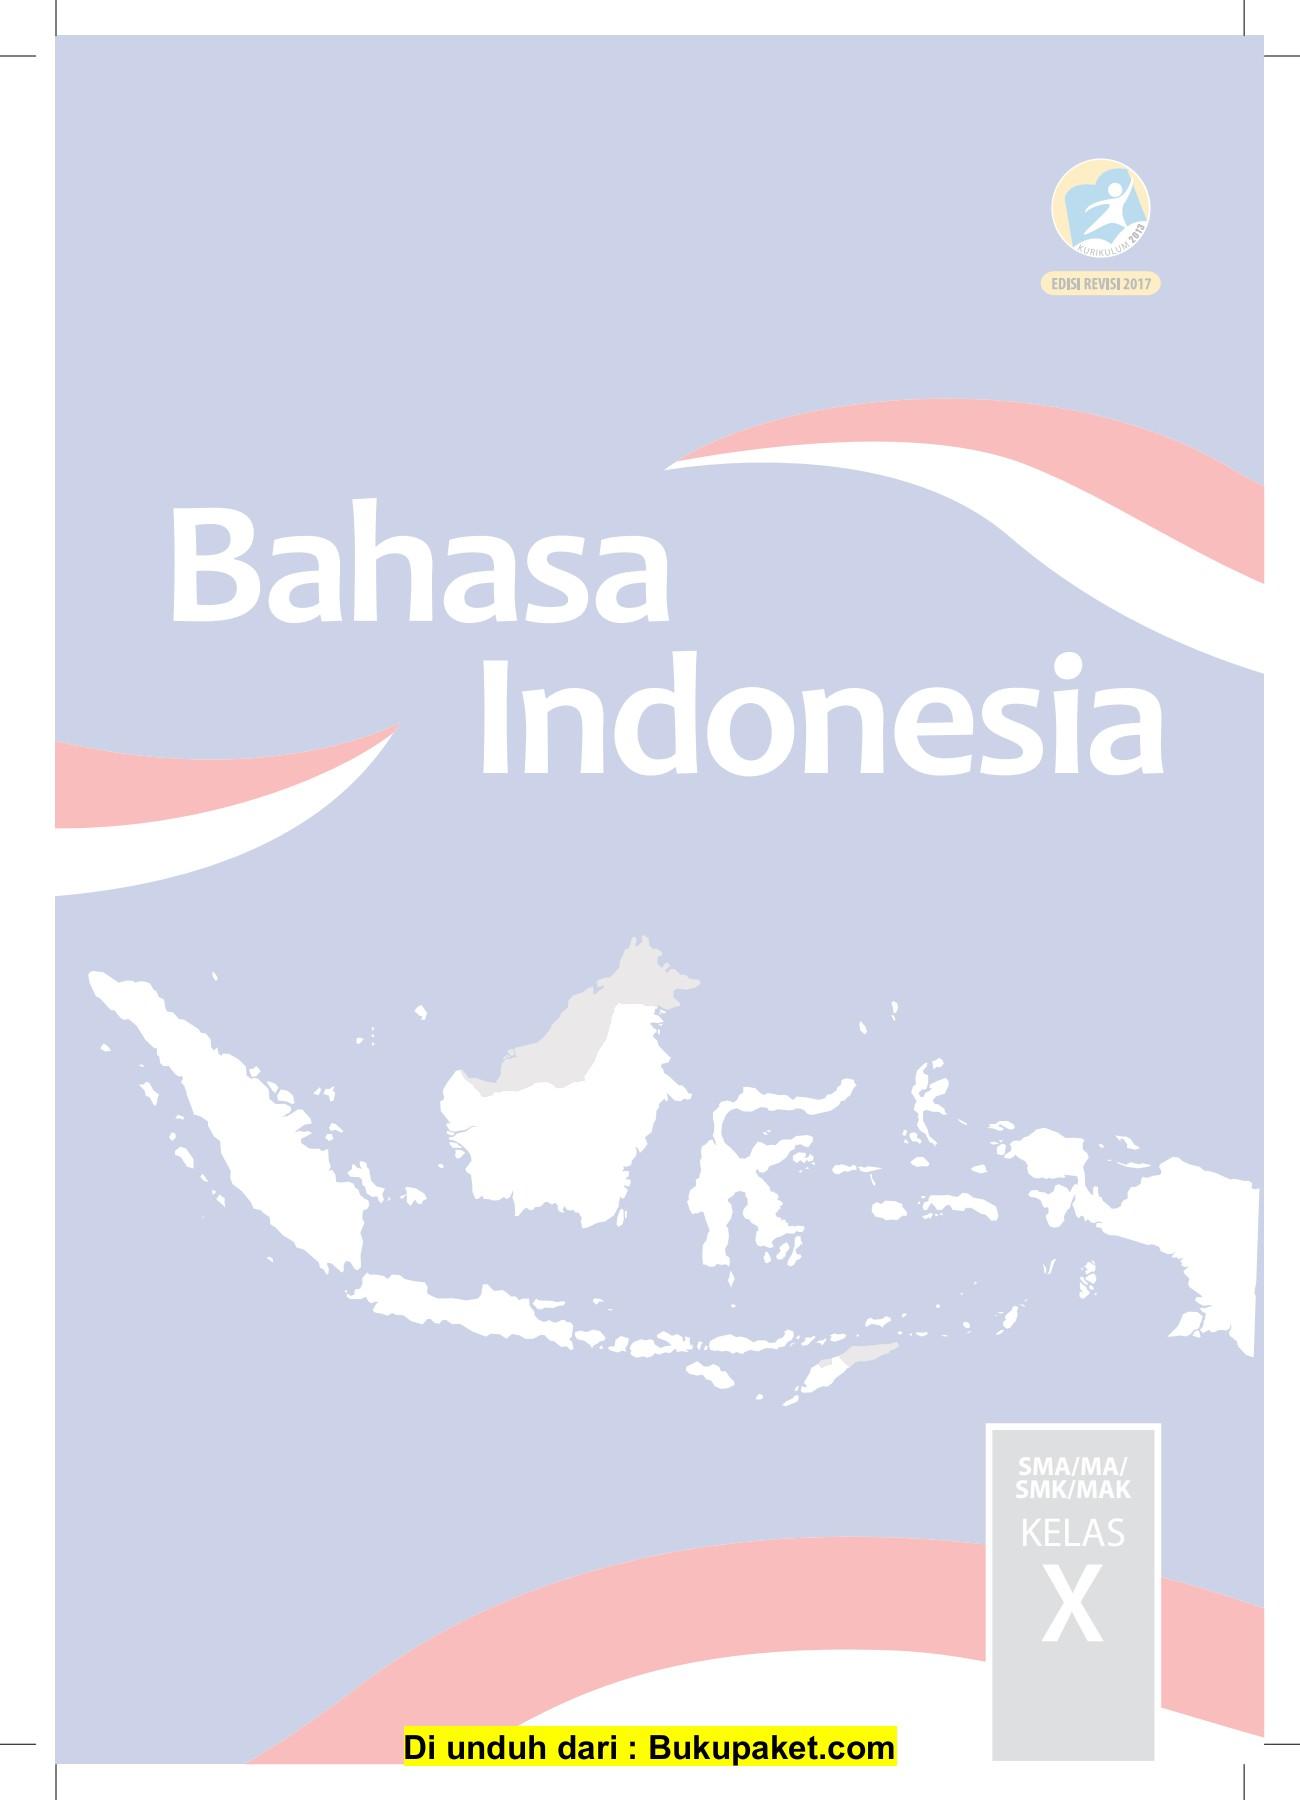 Bahasa Indonesia Kelas 10 : bahasa, indonesia, kelas, Buku_Siswa_Bahasa_Indonesia_Kelas_10_Revisi_2017, Flipbook, MASTURA, FlipHTML5